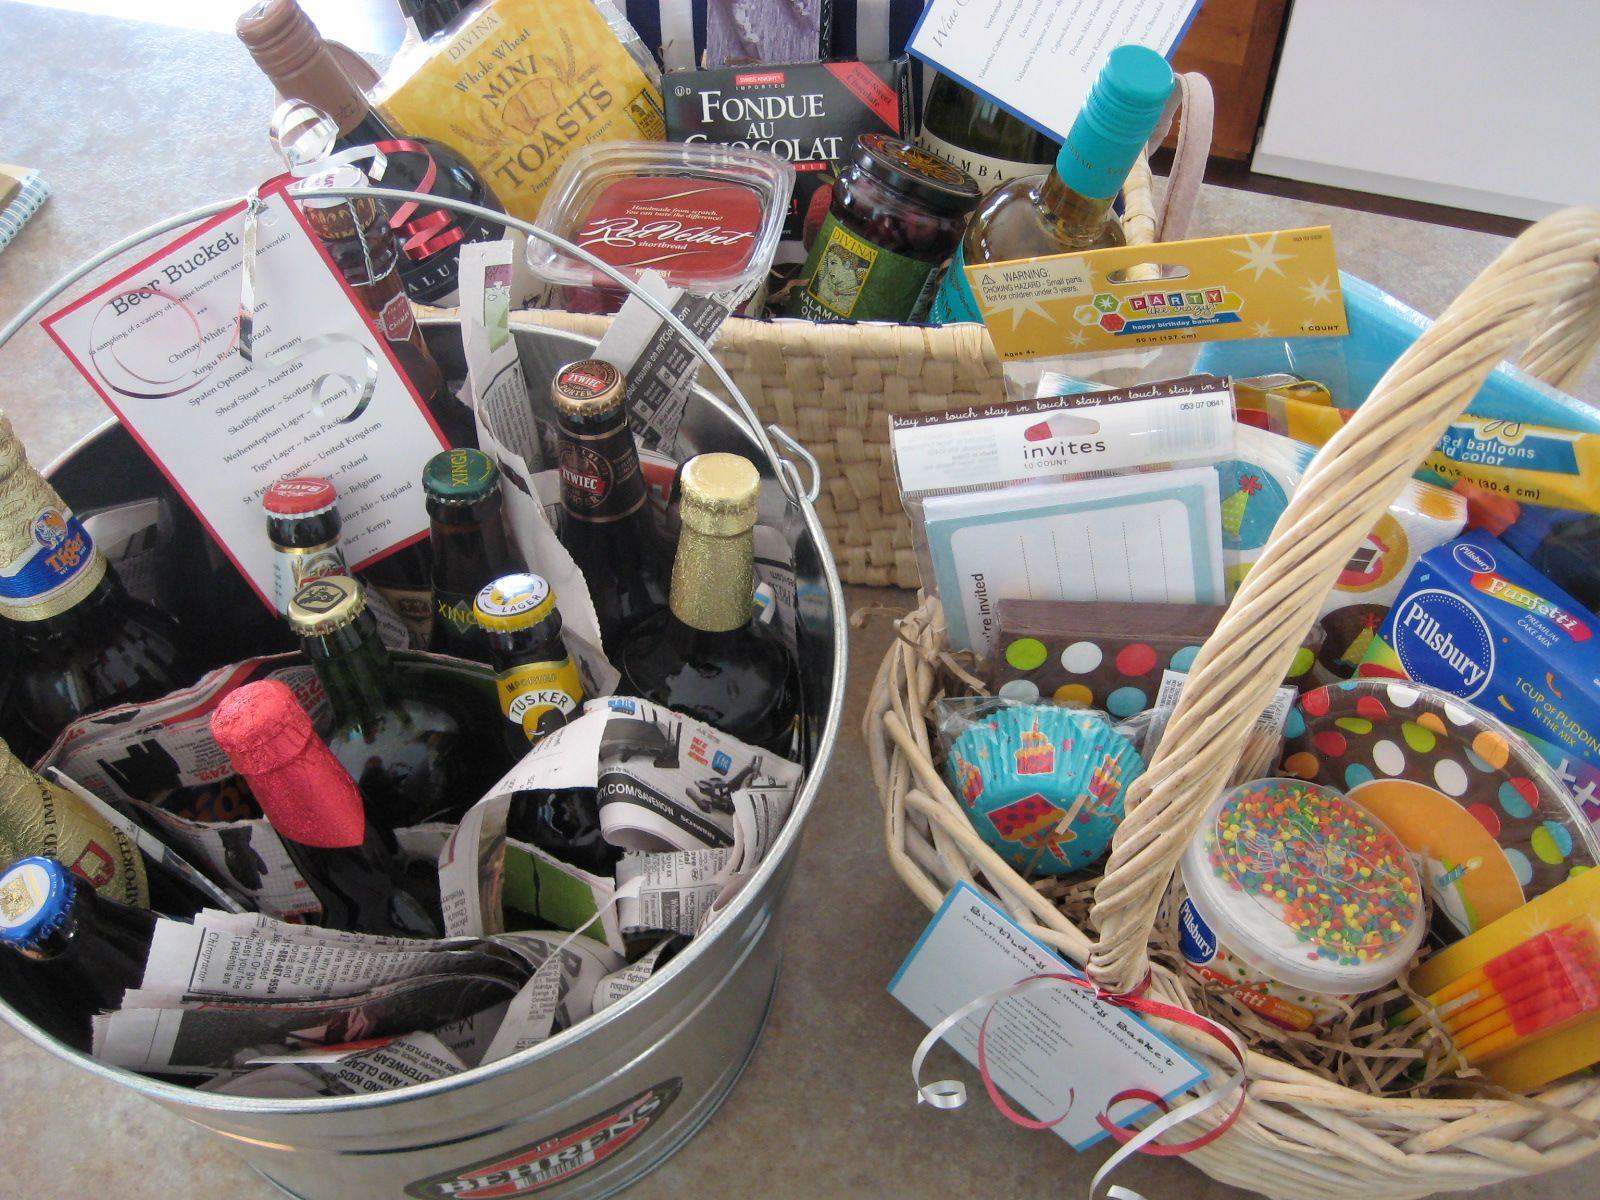 auction baskets - Google Search   Baskets   Pinterest